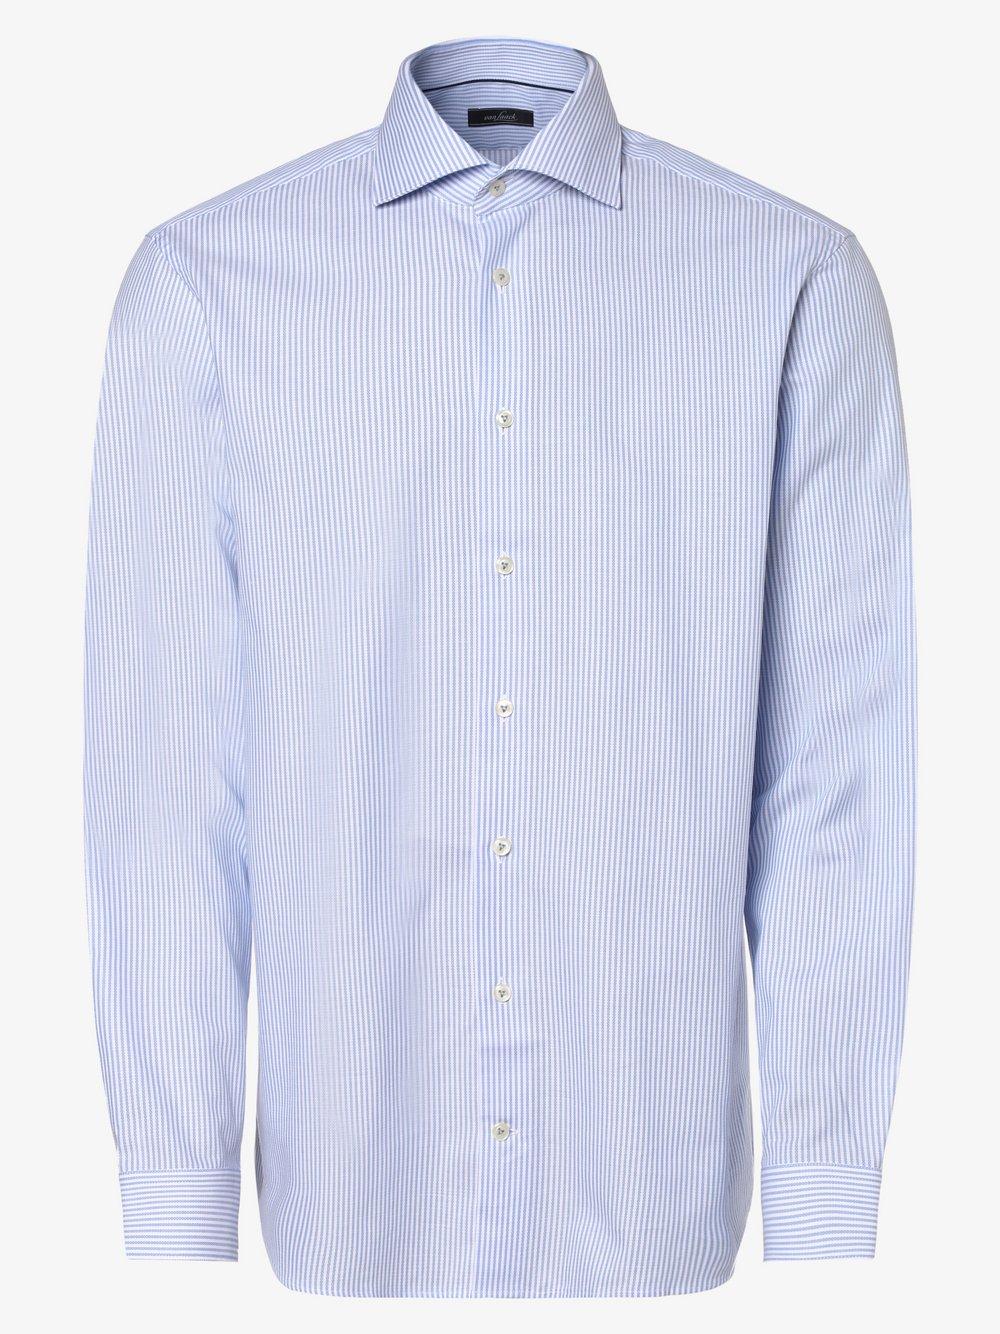 Van Laack – Koszula męska, niebieski Van Graaf 464613-0001